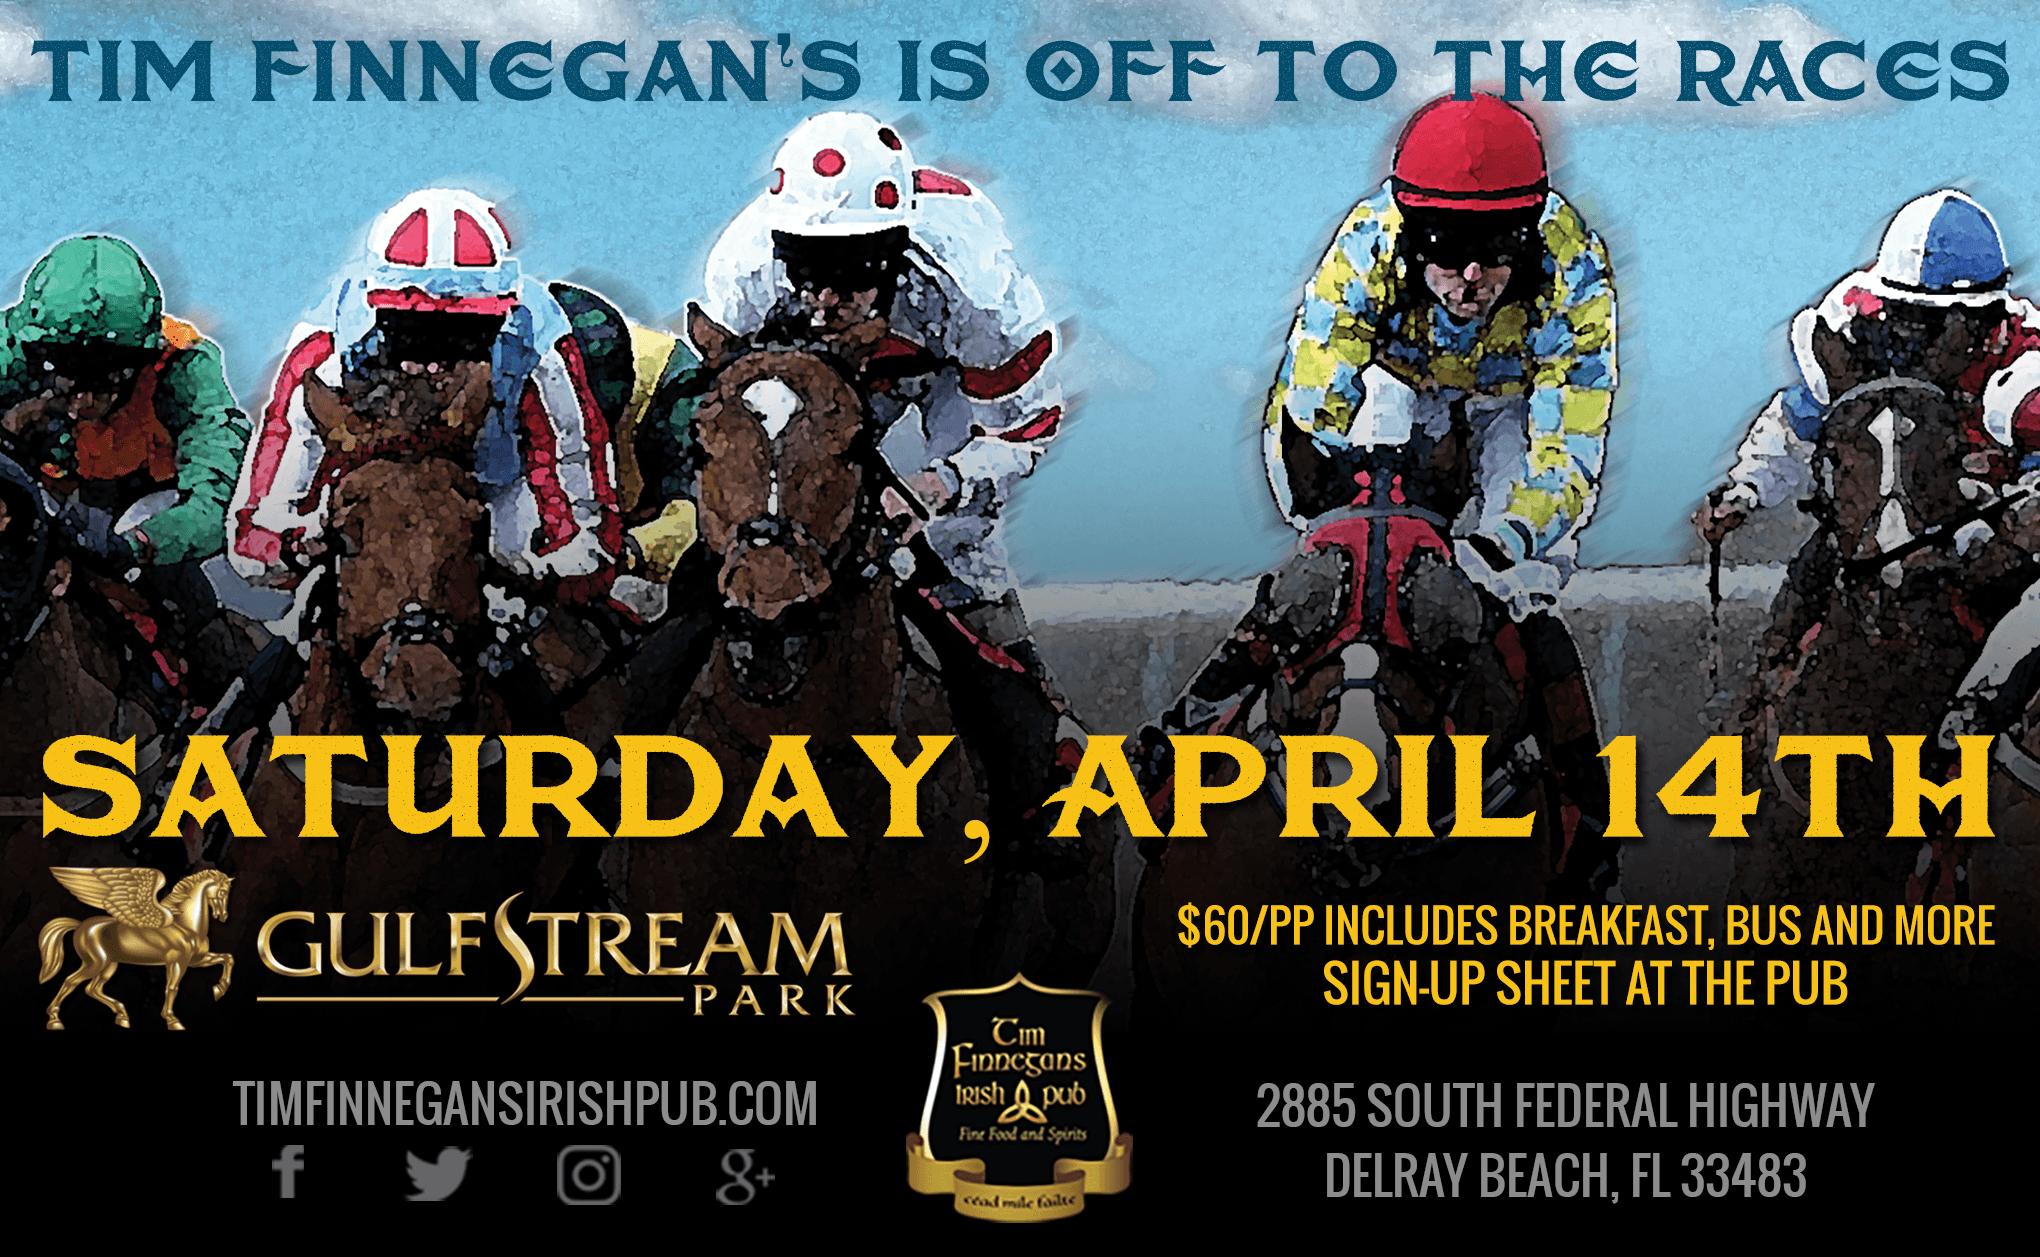 Tim Finnegan's is Off to the Races - Tim Finnegans Irish Pub